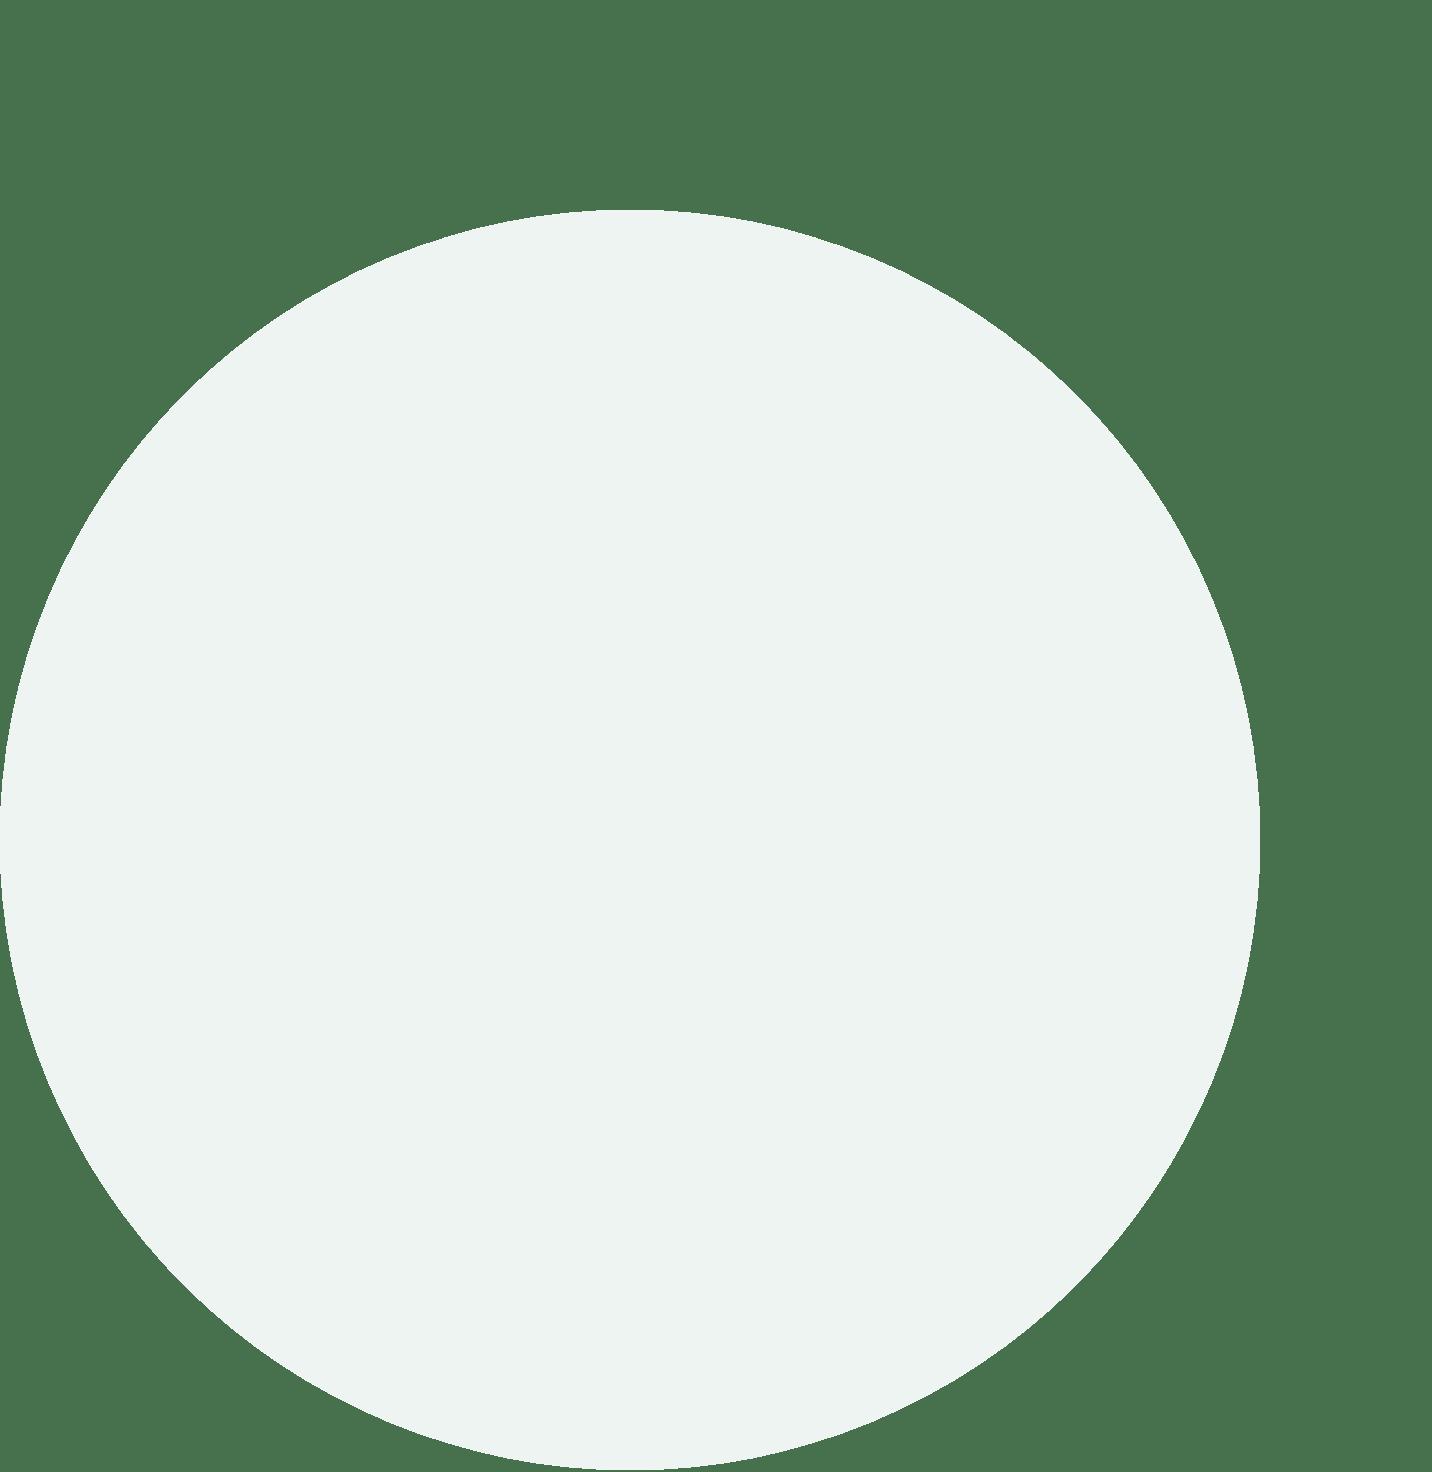 Circle-green-five-min